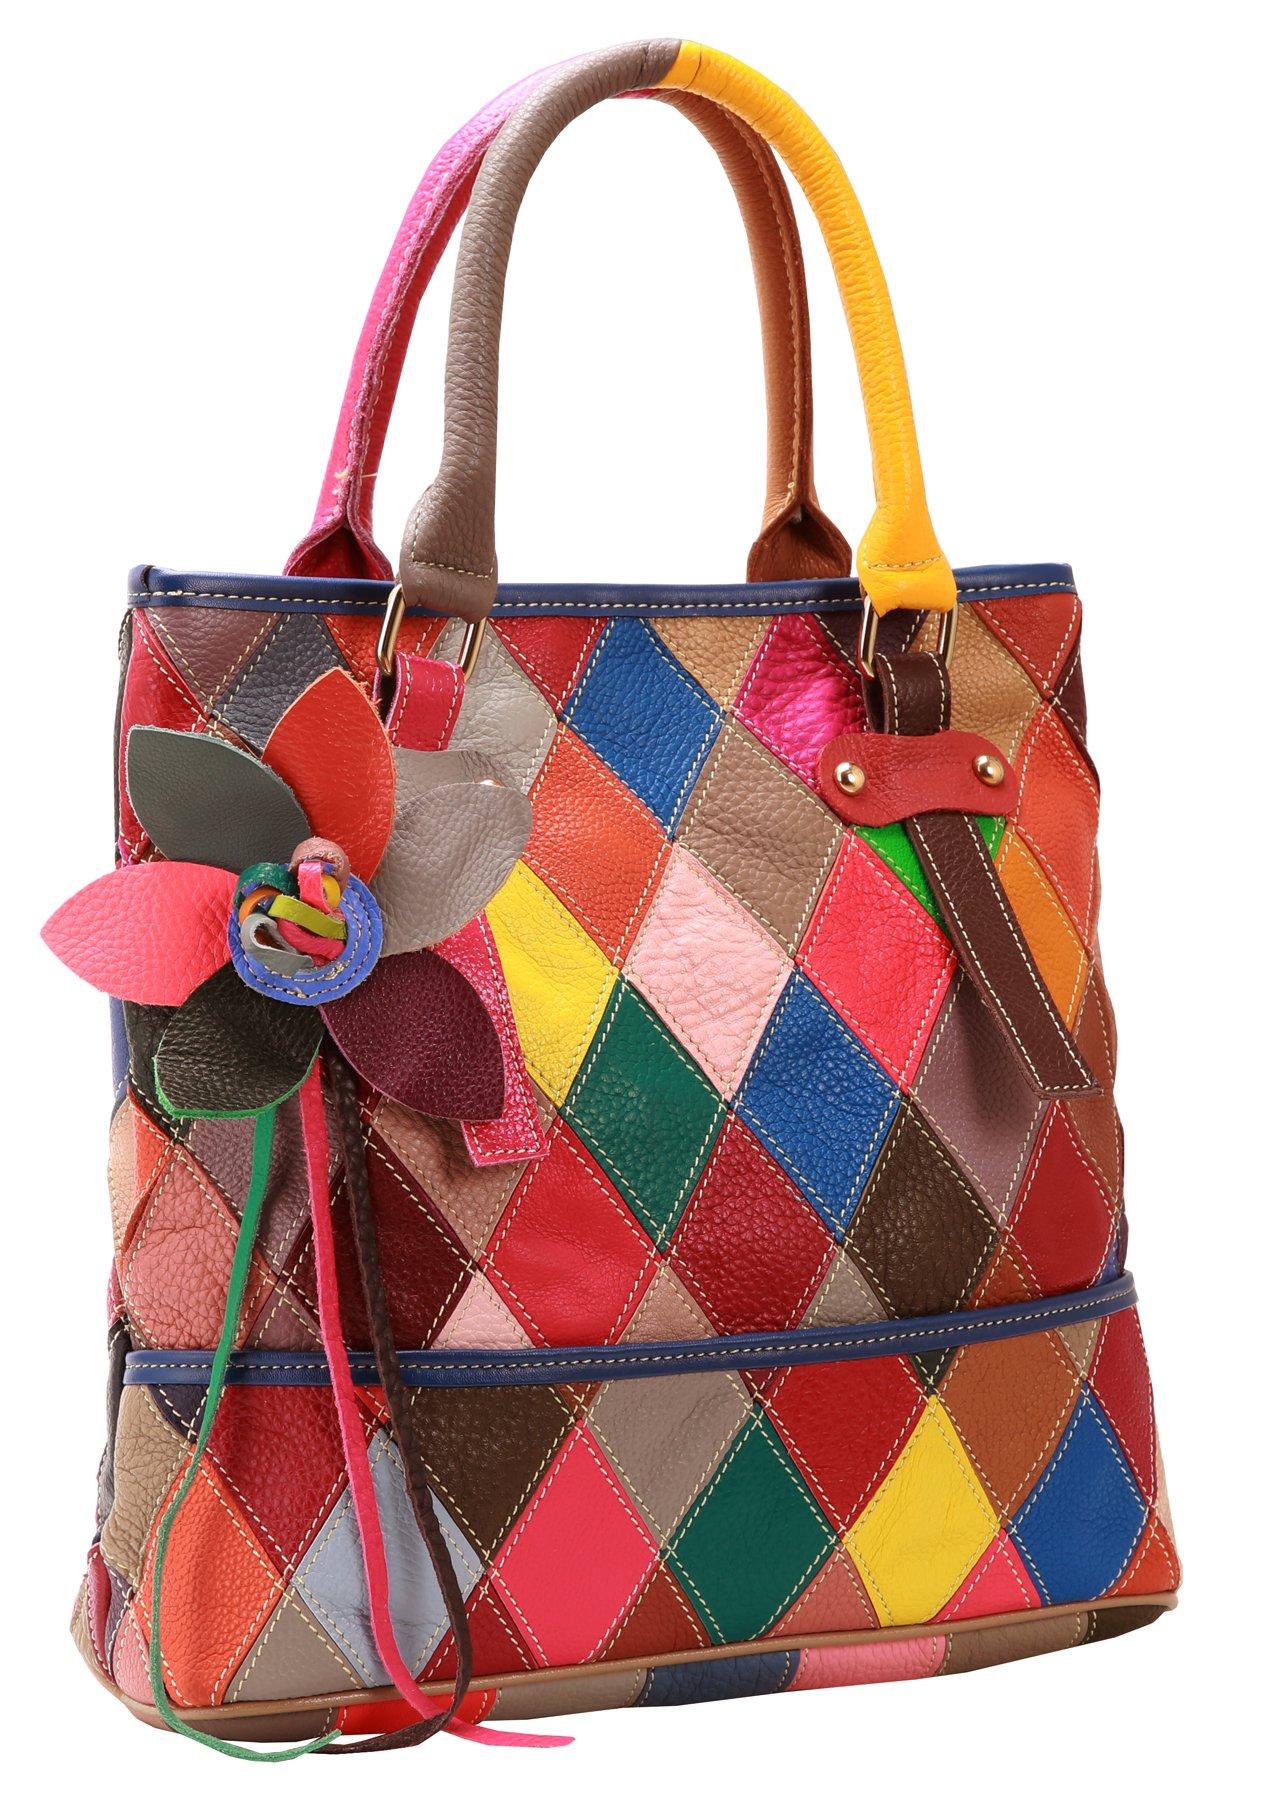 On Clearance Heshe Womens Multi-color Shoulder Bag Hobo Tote Handbag Cross Body Purse (Colorful-2B4009)